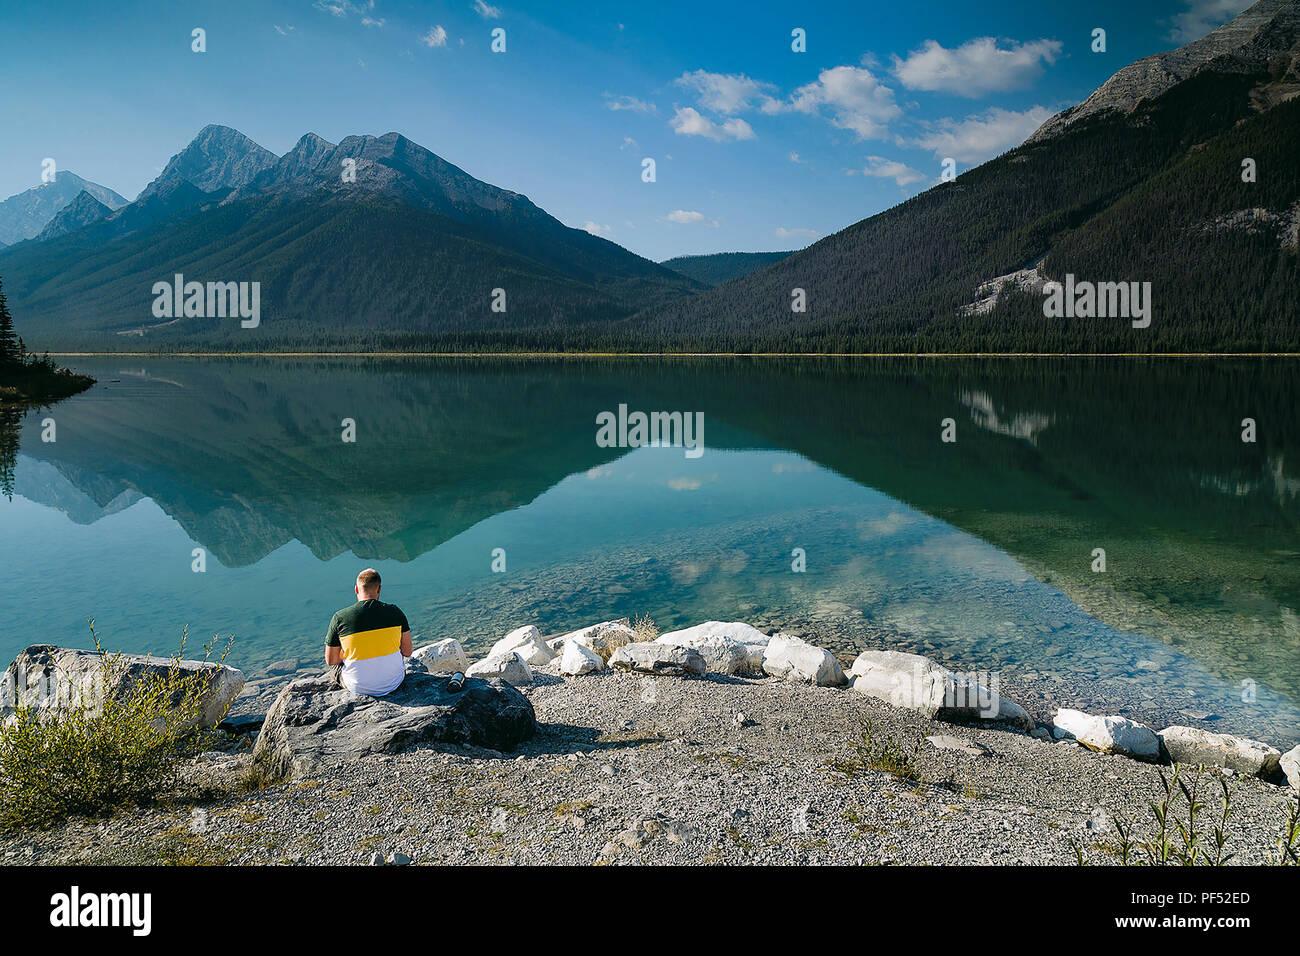 Man Reading in Quiet Contemplation, Spray Lake, Alberta, Canada - Stock Image